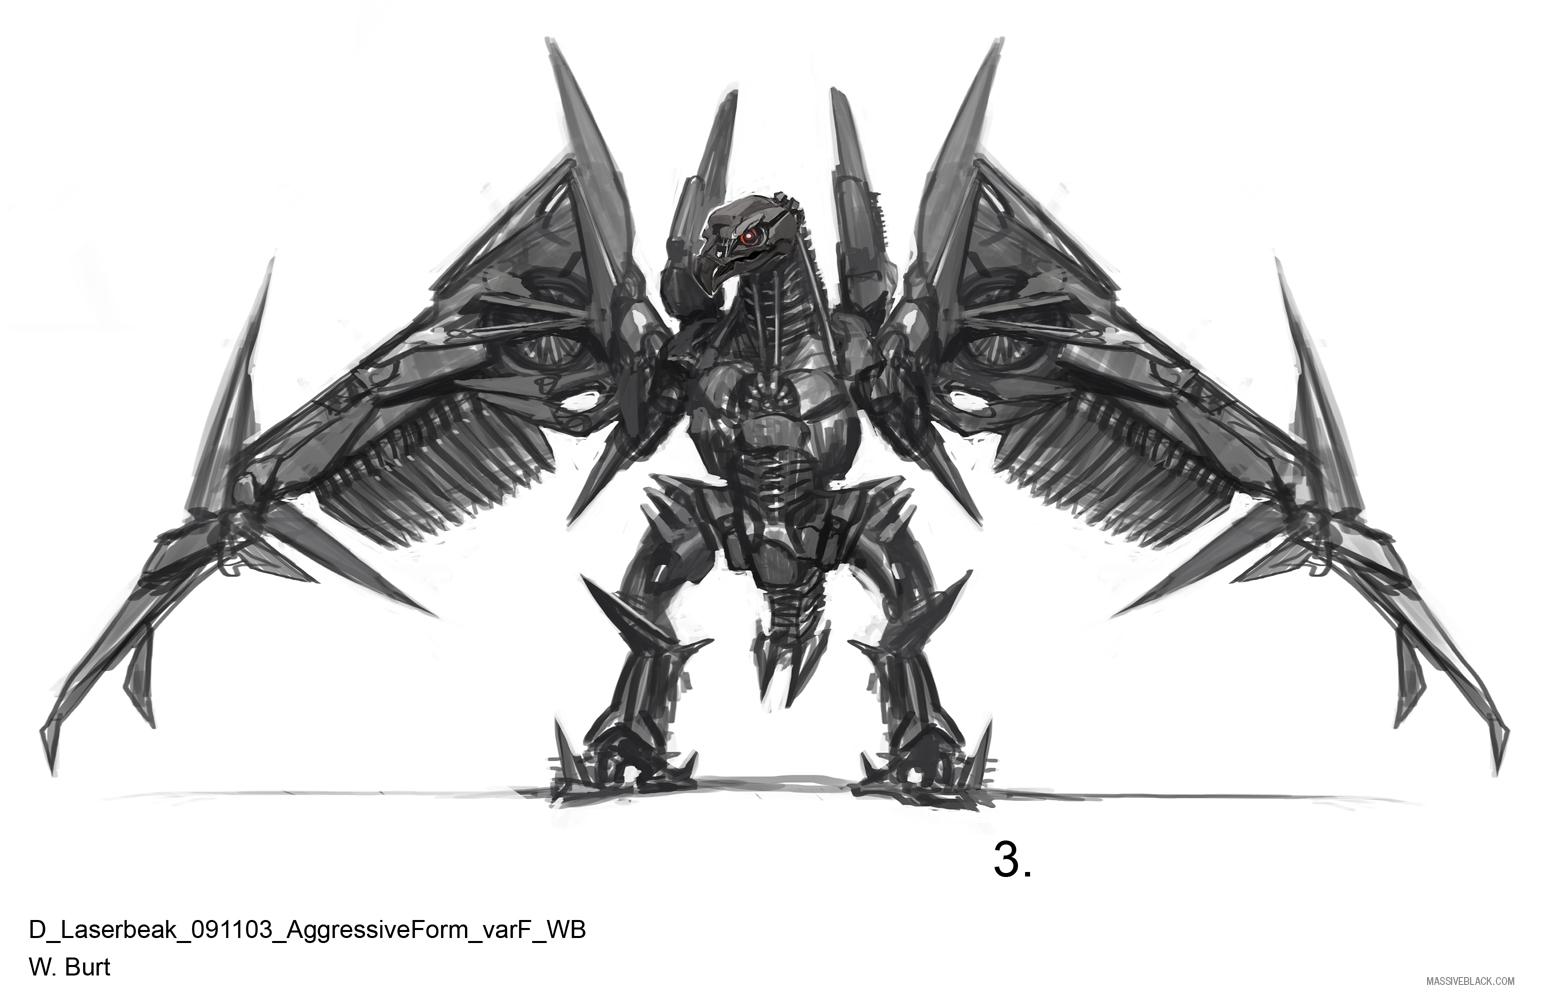 Massive Black Transformers: Dark Of The Moon Concept Art